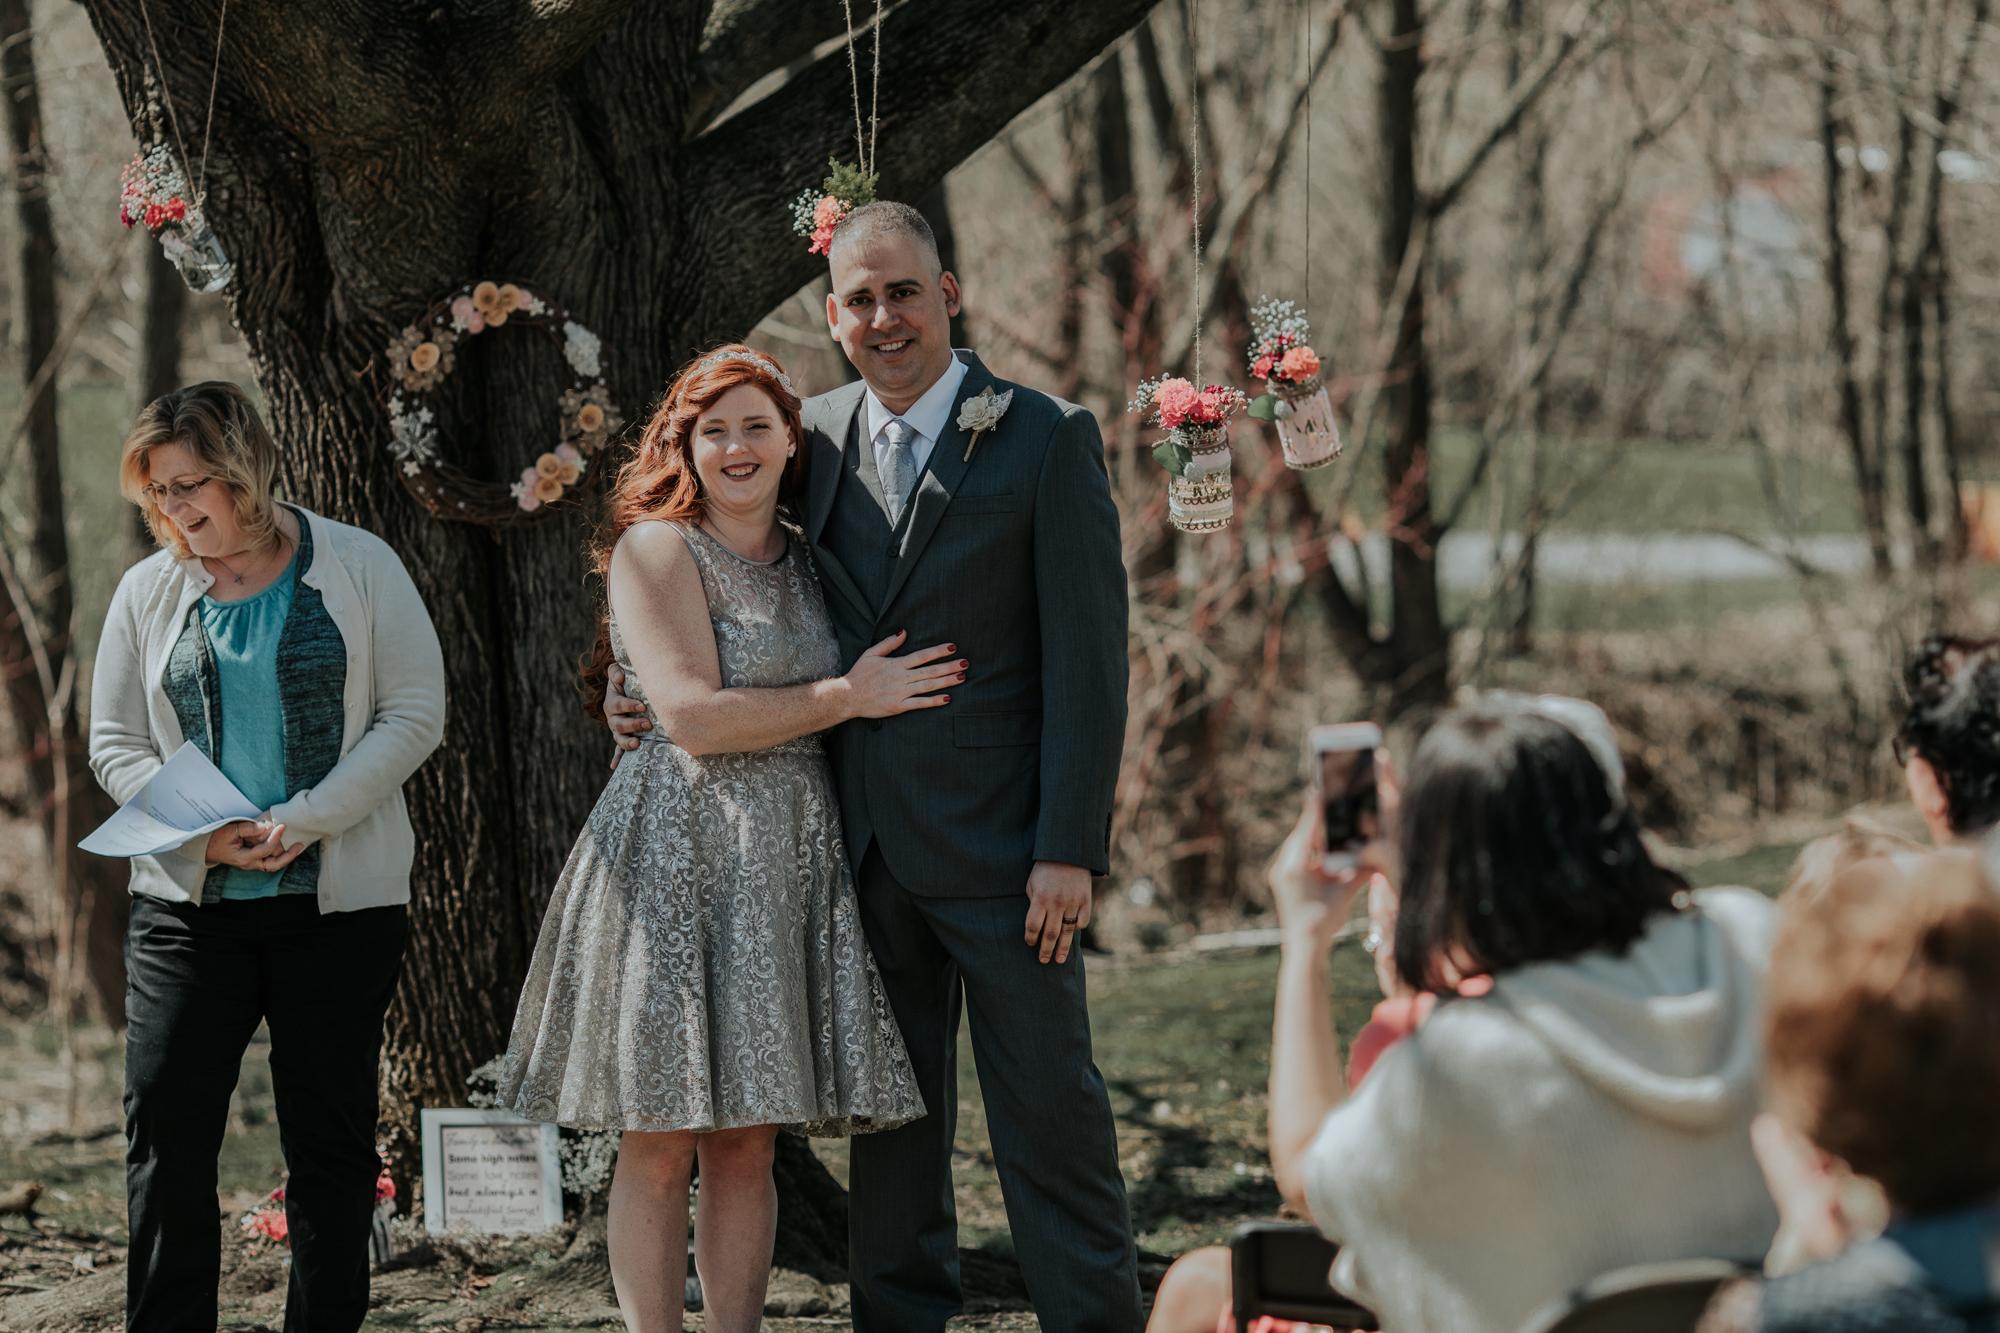 husband-and-wife-photography-wedding-ceremony